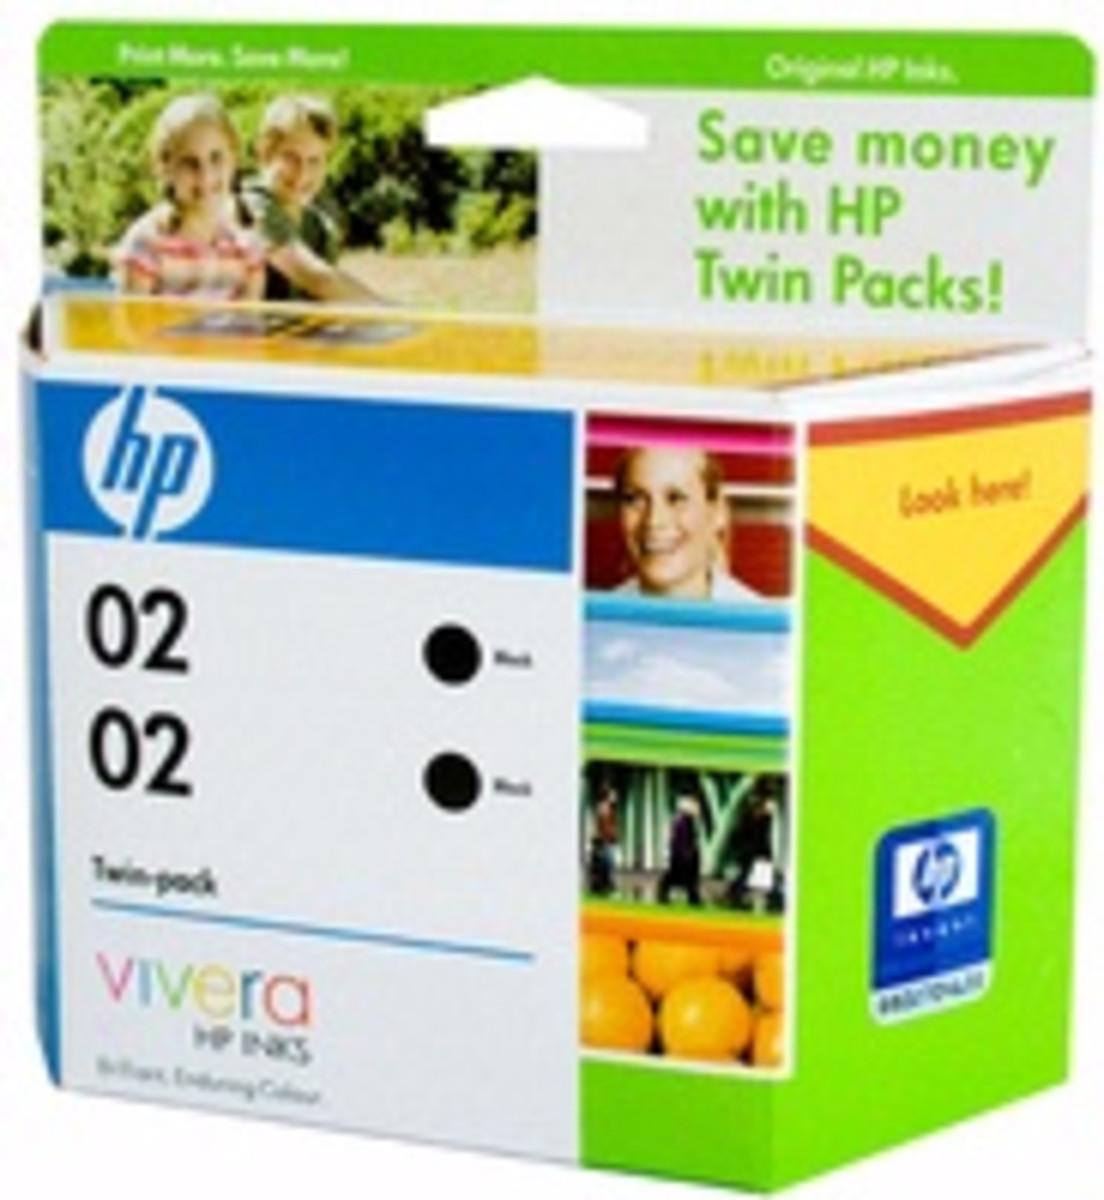 HP 02 (CE015AA) Black Ink Cartridge - Twin Pack